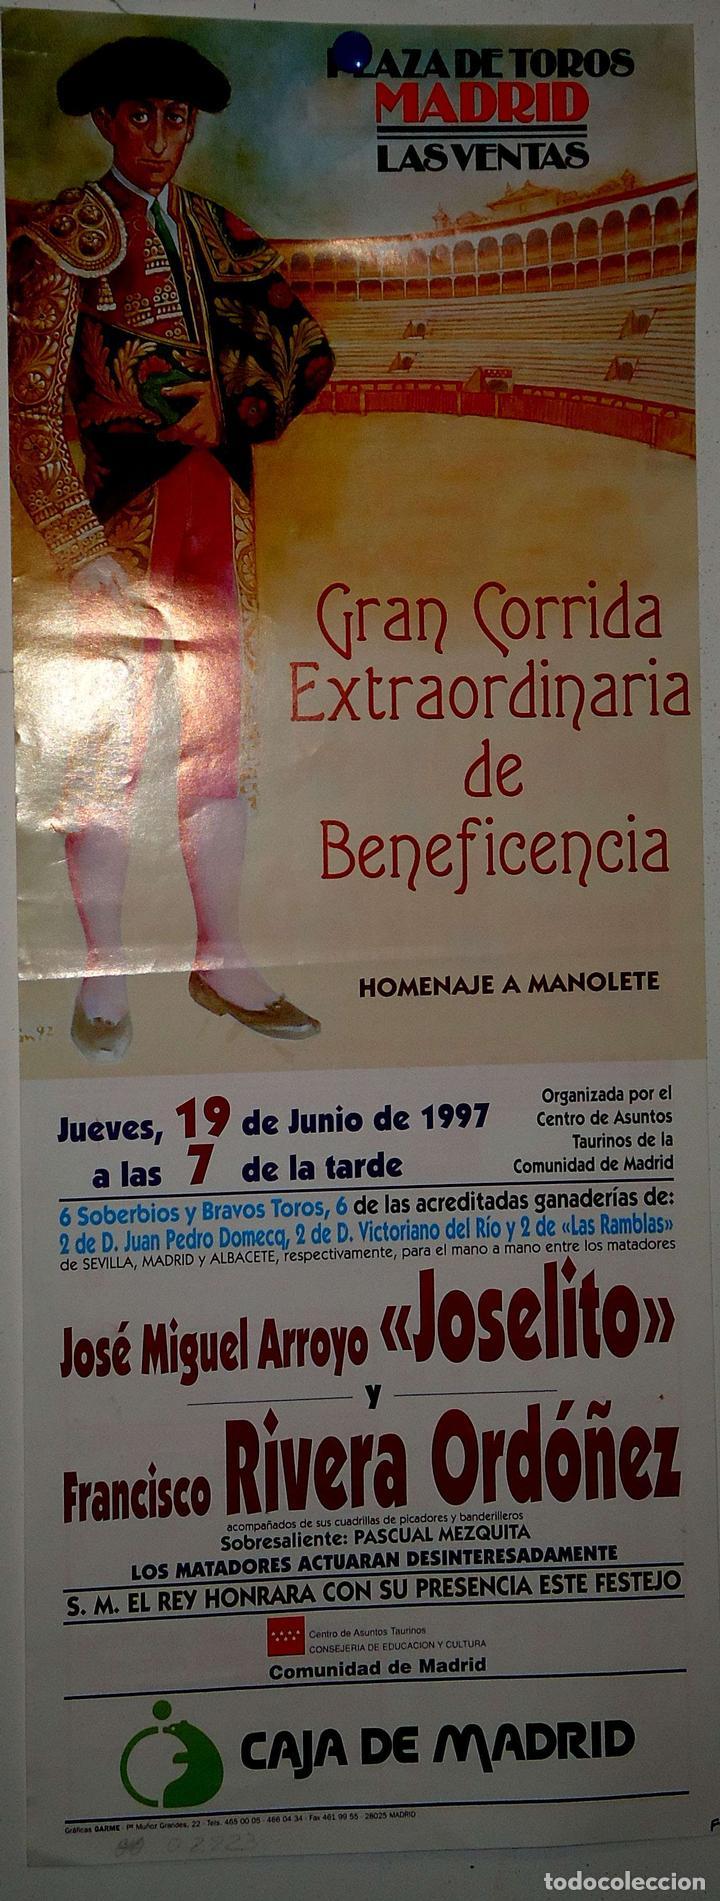 1997 CARTEL PLAZA TOROS DE MADRID 19 JUNIO 1997 MED 18X 42 CTM (Coleccionismo - Carteles Gran Formato - Carteles Toros)